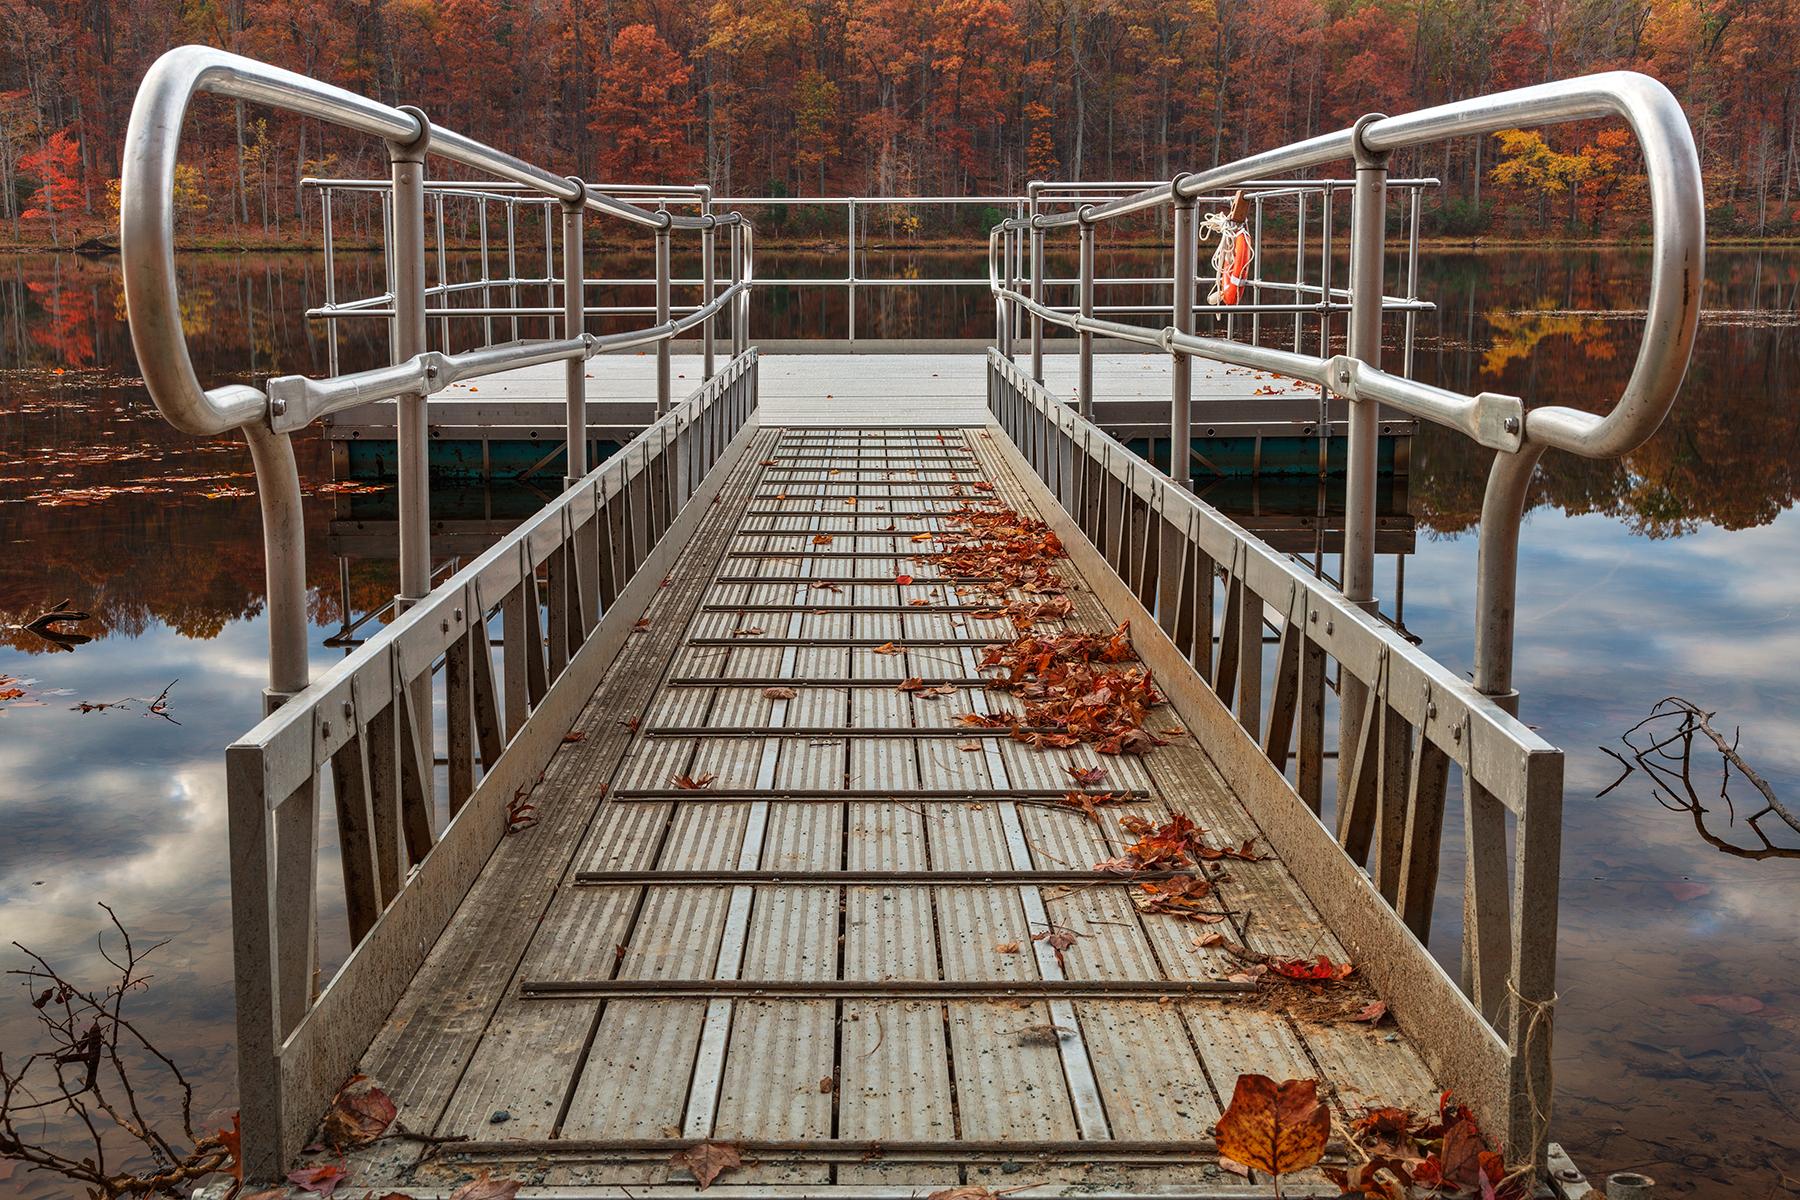 Autumn lake boardwalk - hdr photo